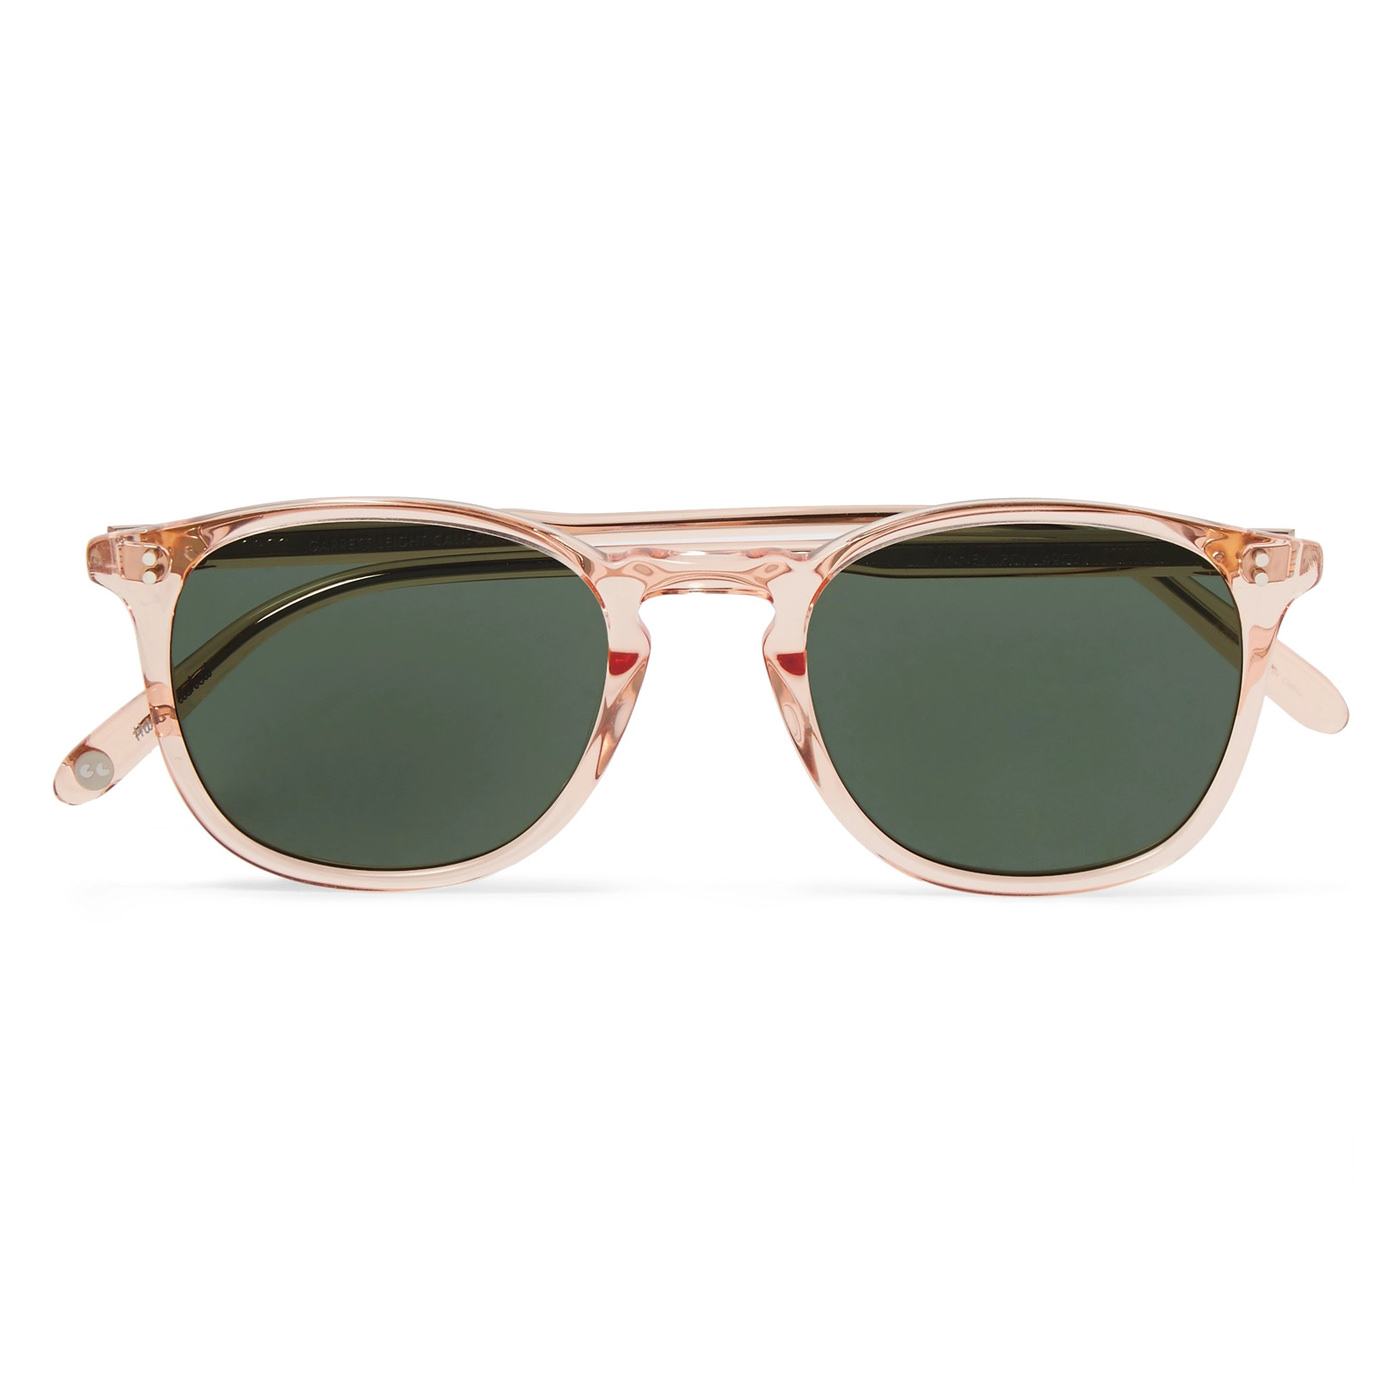 Style Mr Porter Lunettes de Soleil Garrett Leight Transparente Acetate Rose